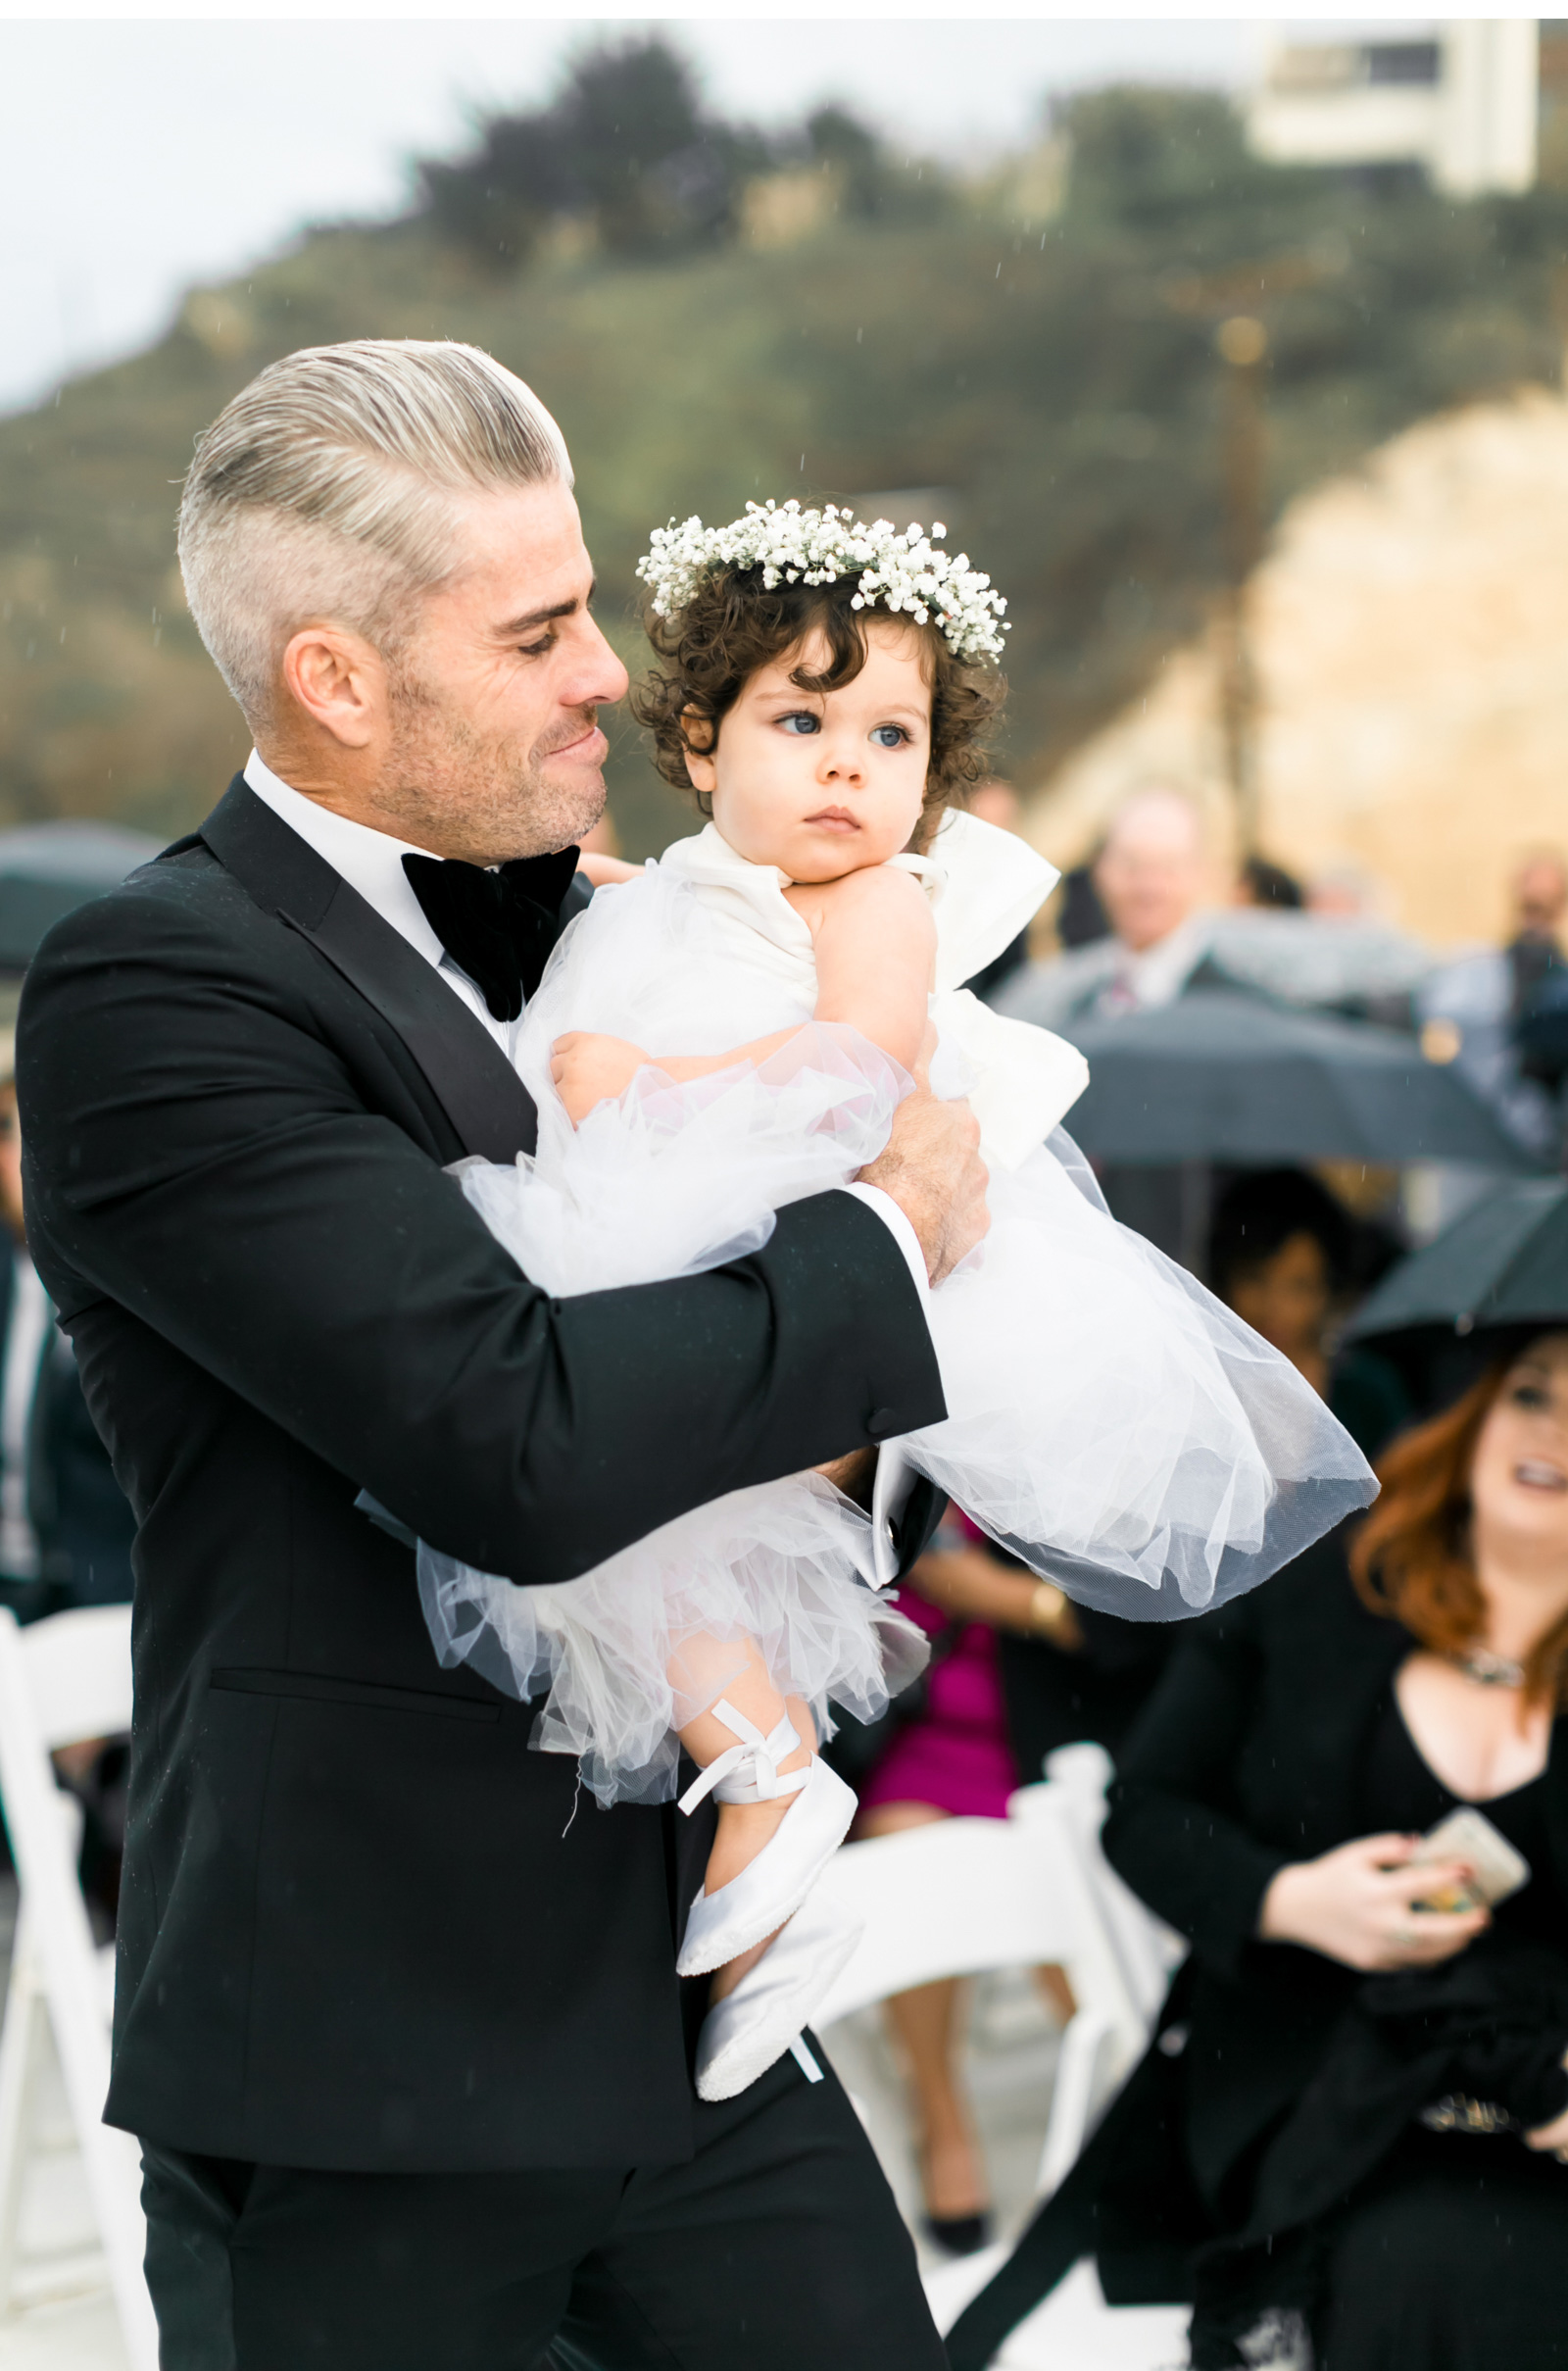 Malibu-Wedding-Natalie-Schutt-Photography-Style-Me-Pretty_04.jpg